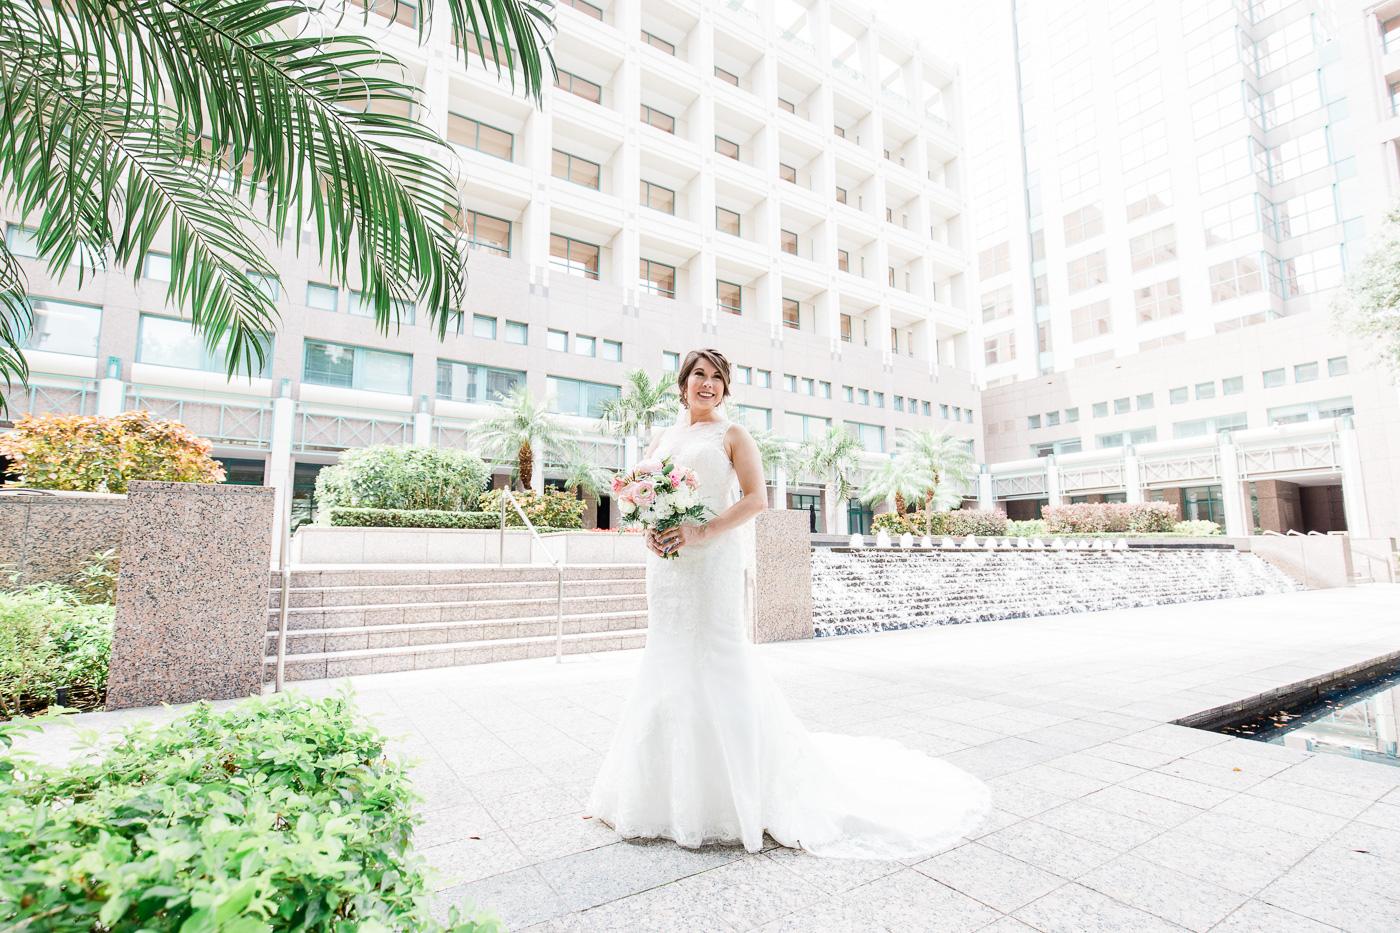 Downtown-Orlando-Wedding-4.jpg